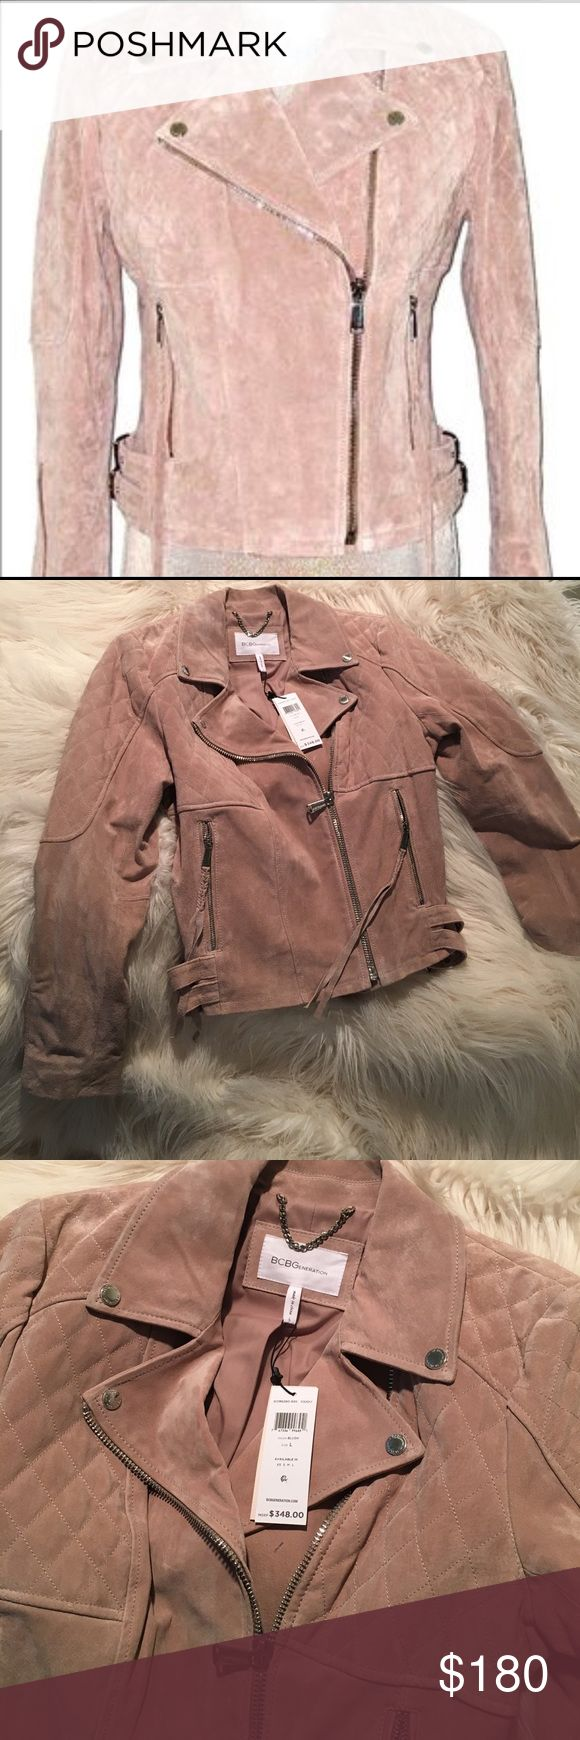 BCBGeneration Blush Suede Moto Jacket Gorgeous BCBGeneration Blush Suede Moto Jacket. Perfect condition. Never been worn. BCBGeneration Jackets & Coats